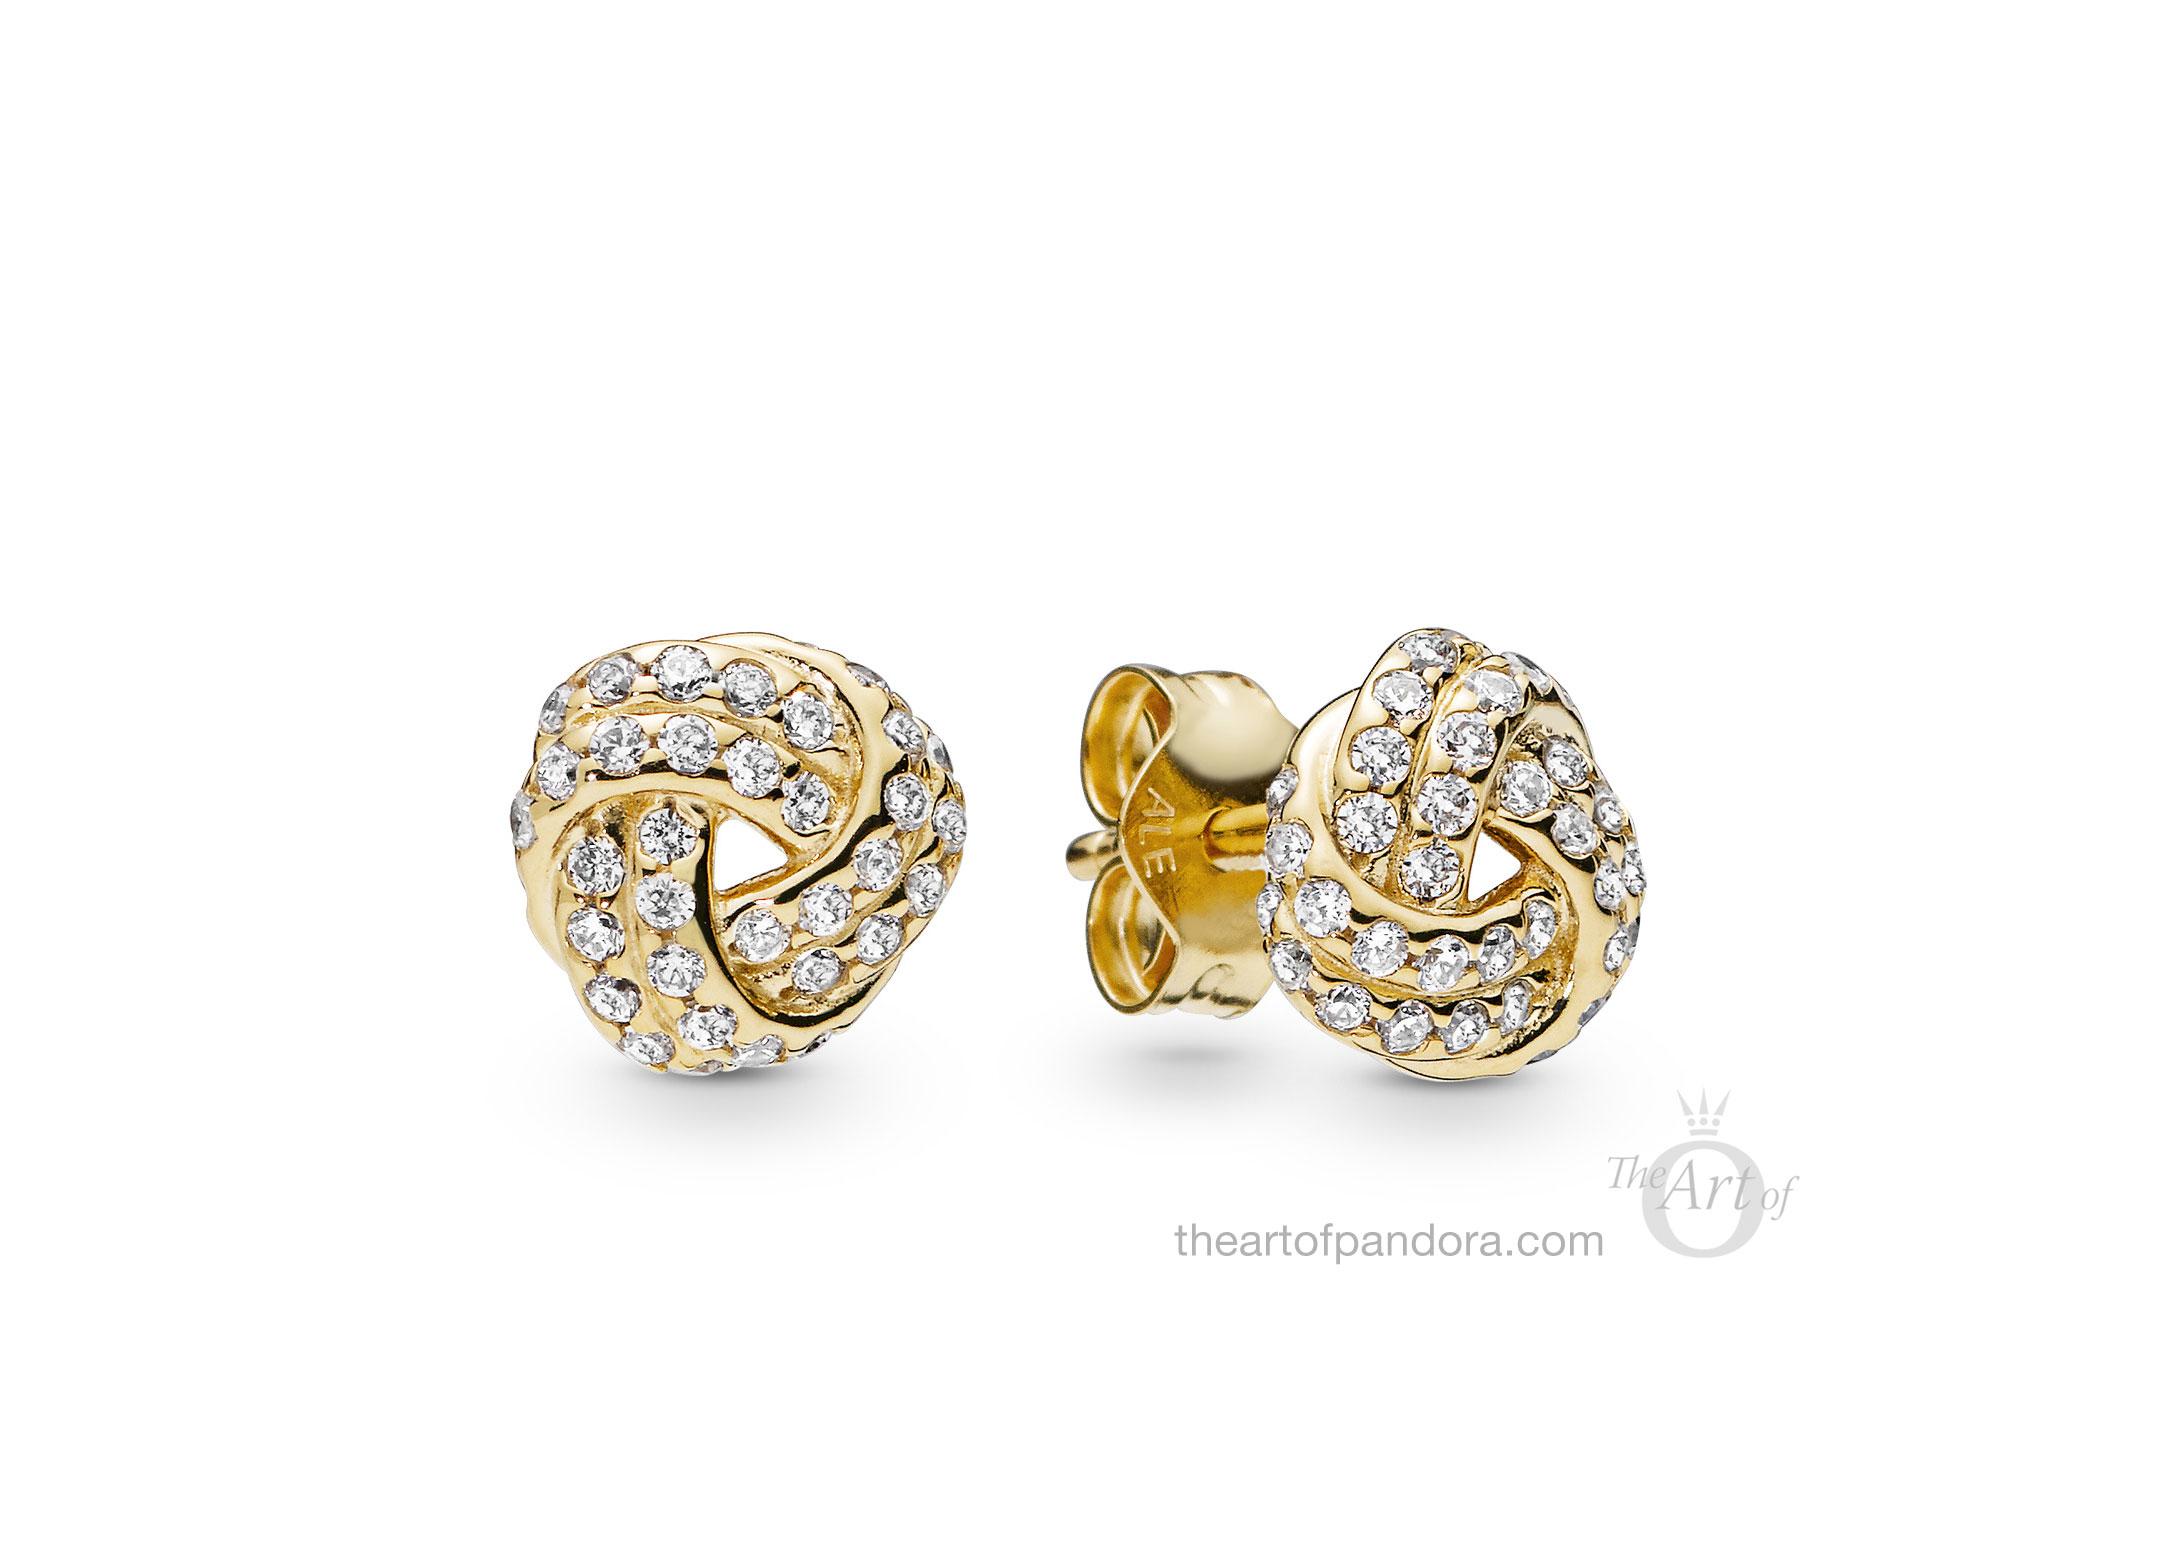 ac6847db6 260696CZ-PANDORA-Shine-Sparkling-Love-Knots-Earrings - The Art of ...